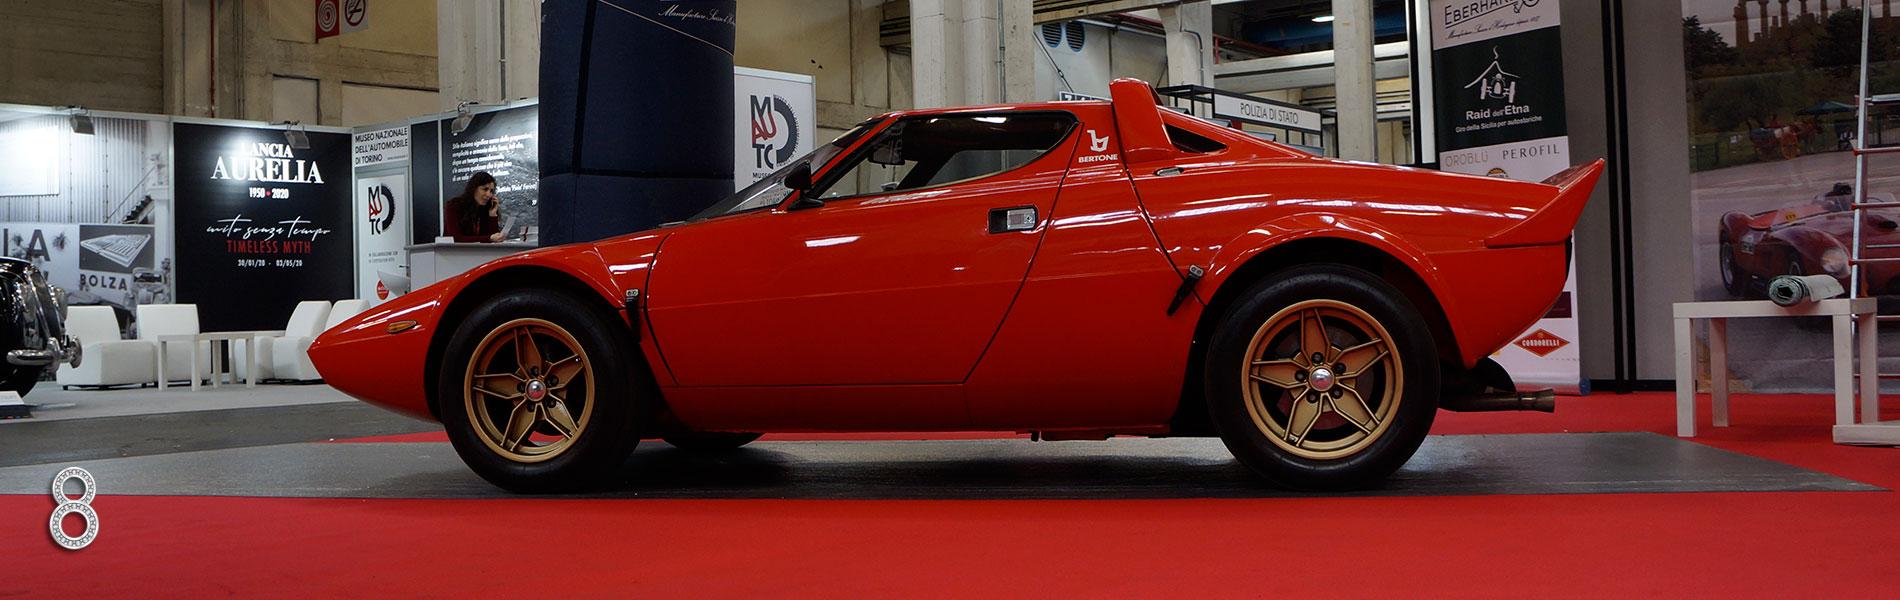 Lancia Stratos Stradale - Automotoretrò 2020